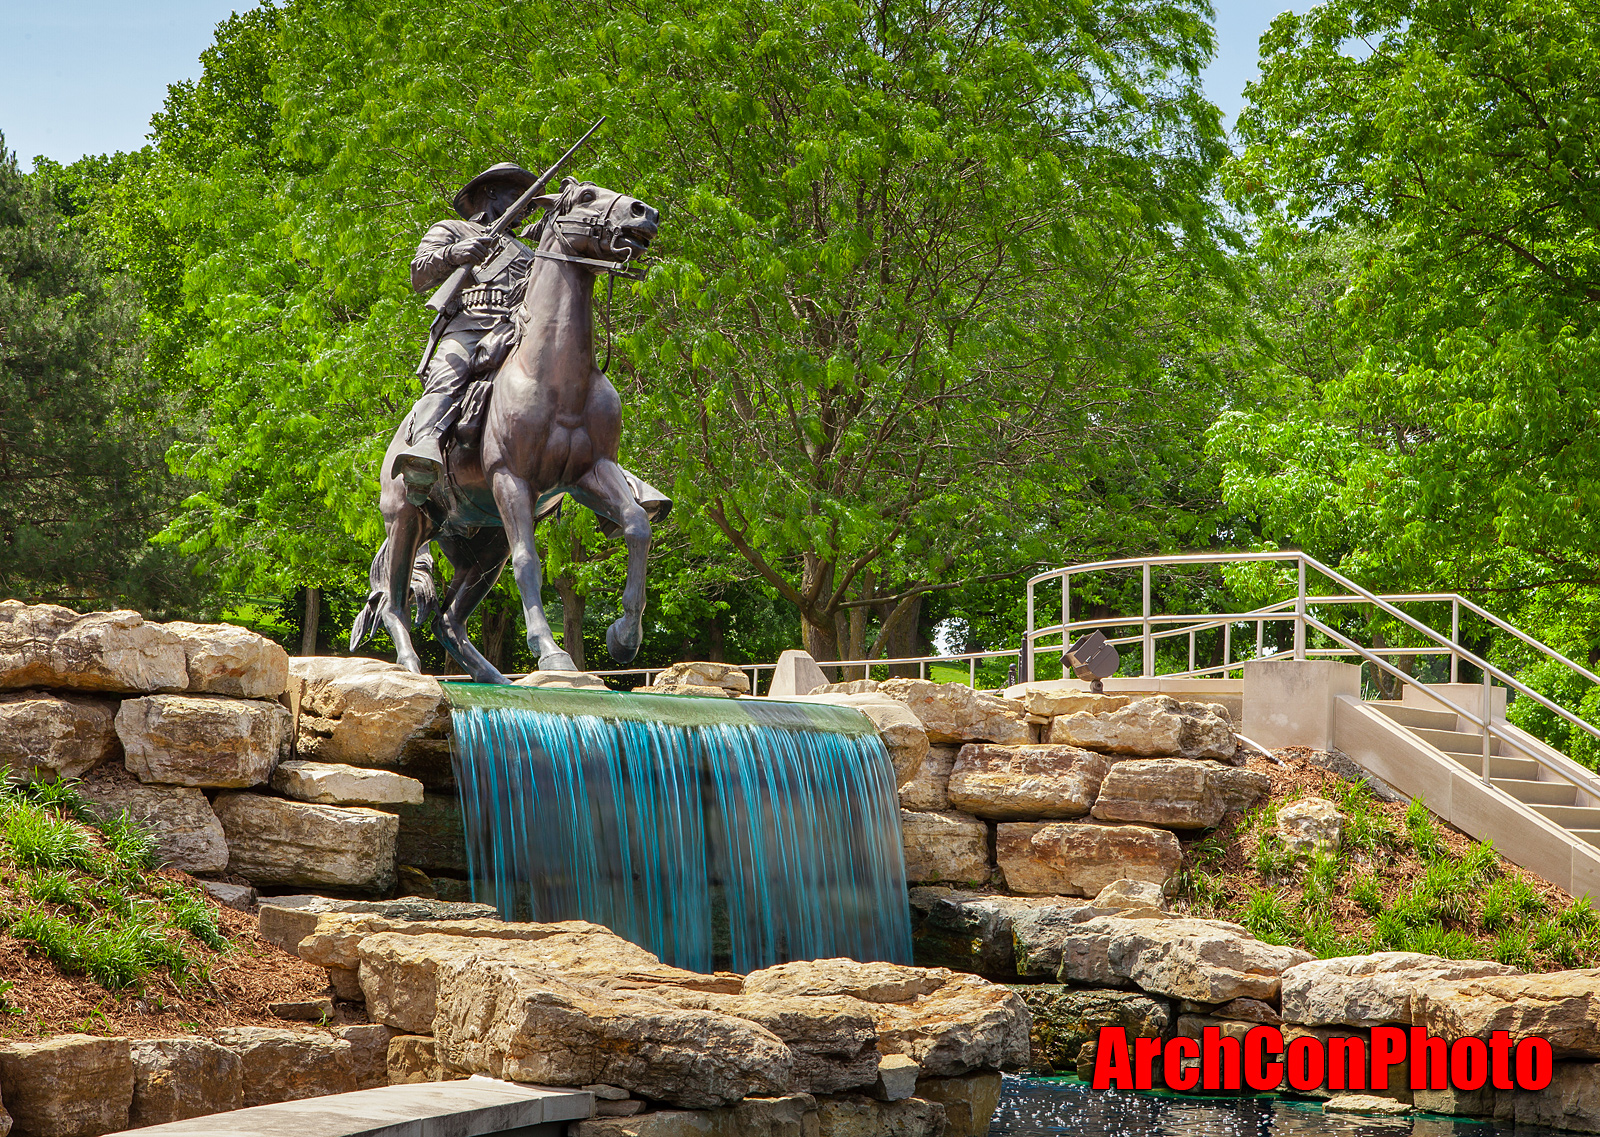 Architectural Photography ArchConPhoto June 2012